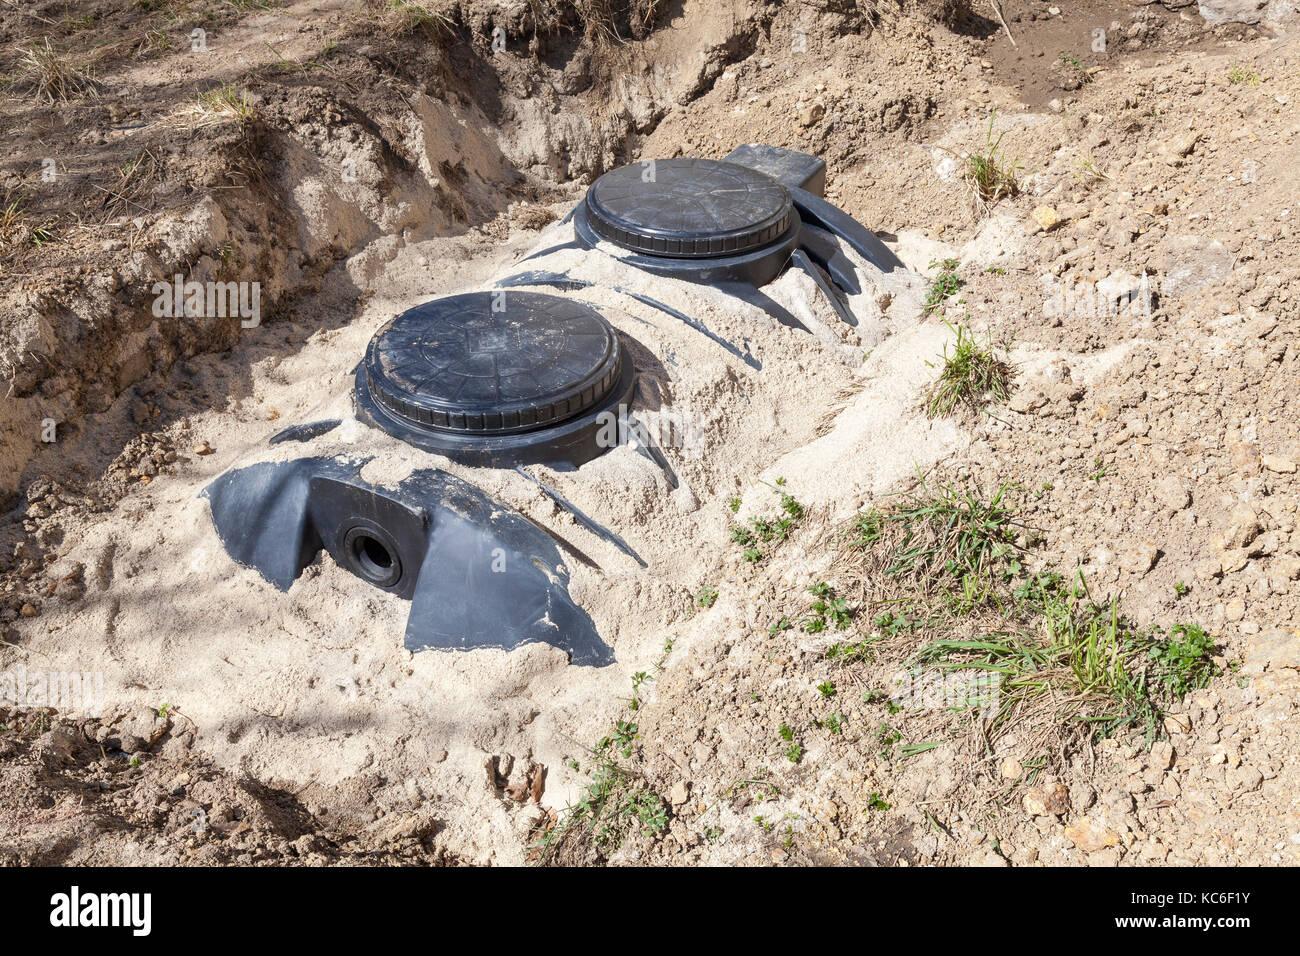 Exposed Plumbing Stock Photos Amp Exposed Plumbing Stock